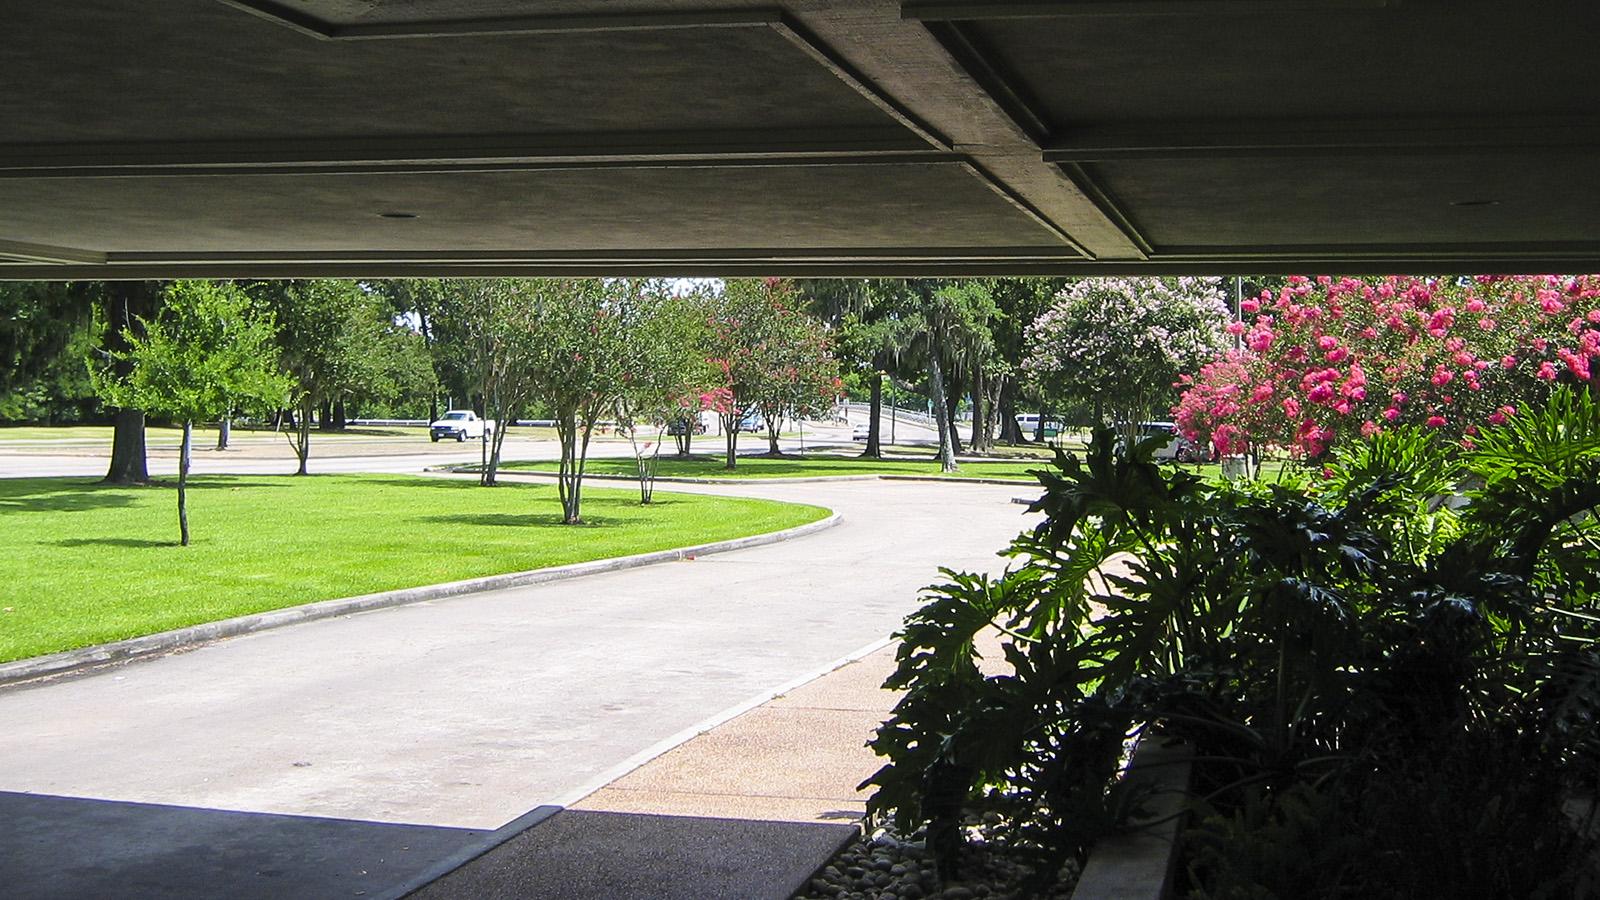 TX_Houston_GraggPark_06_CharlesBirnbaum_2005_Signature.jpg